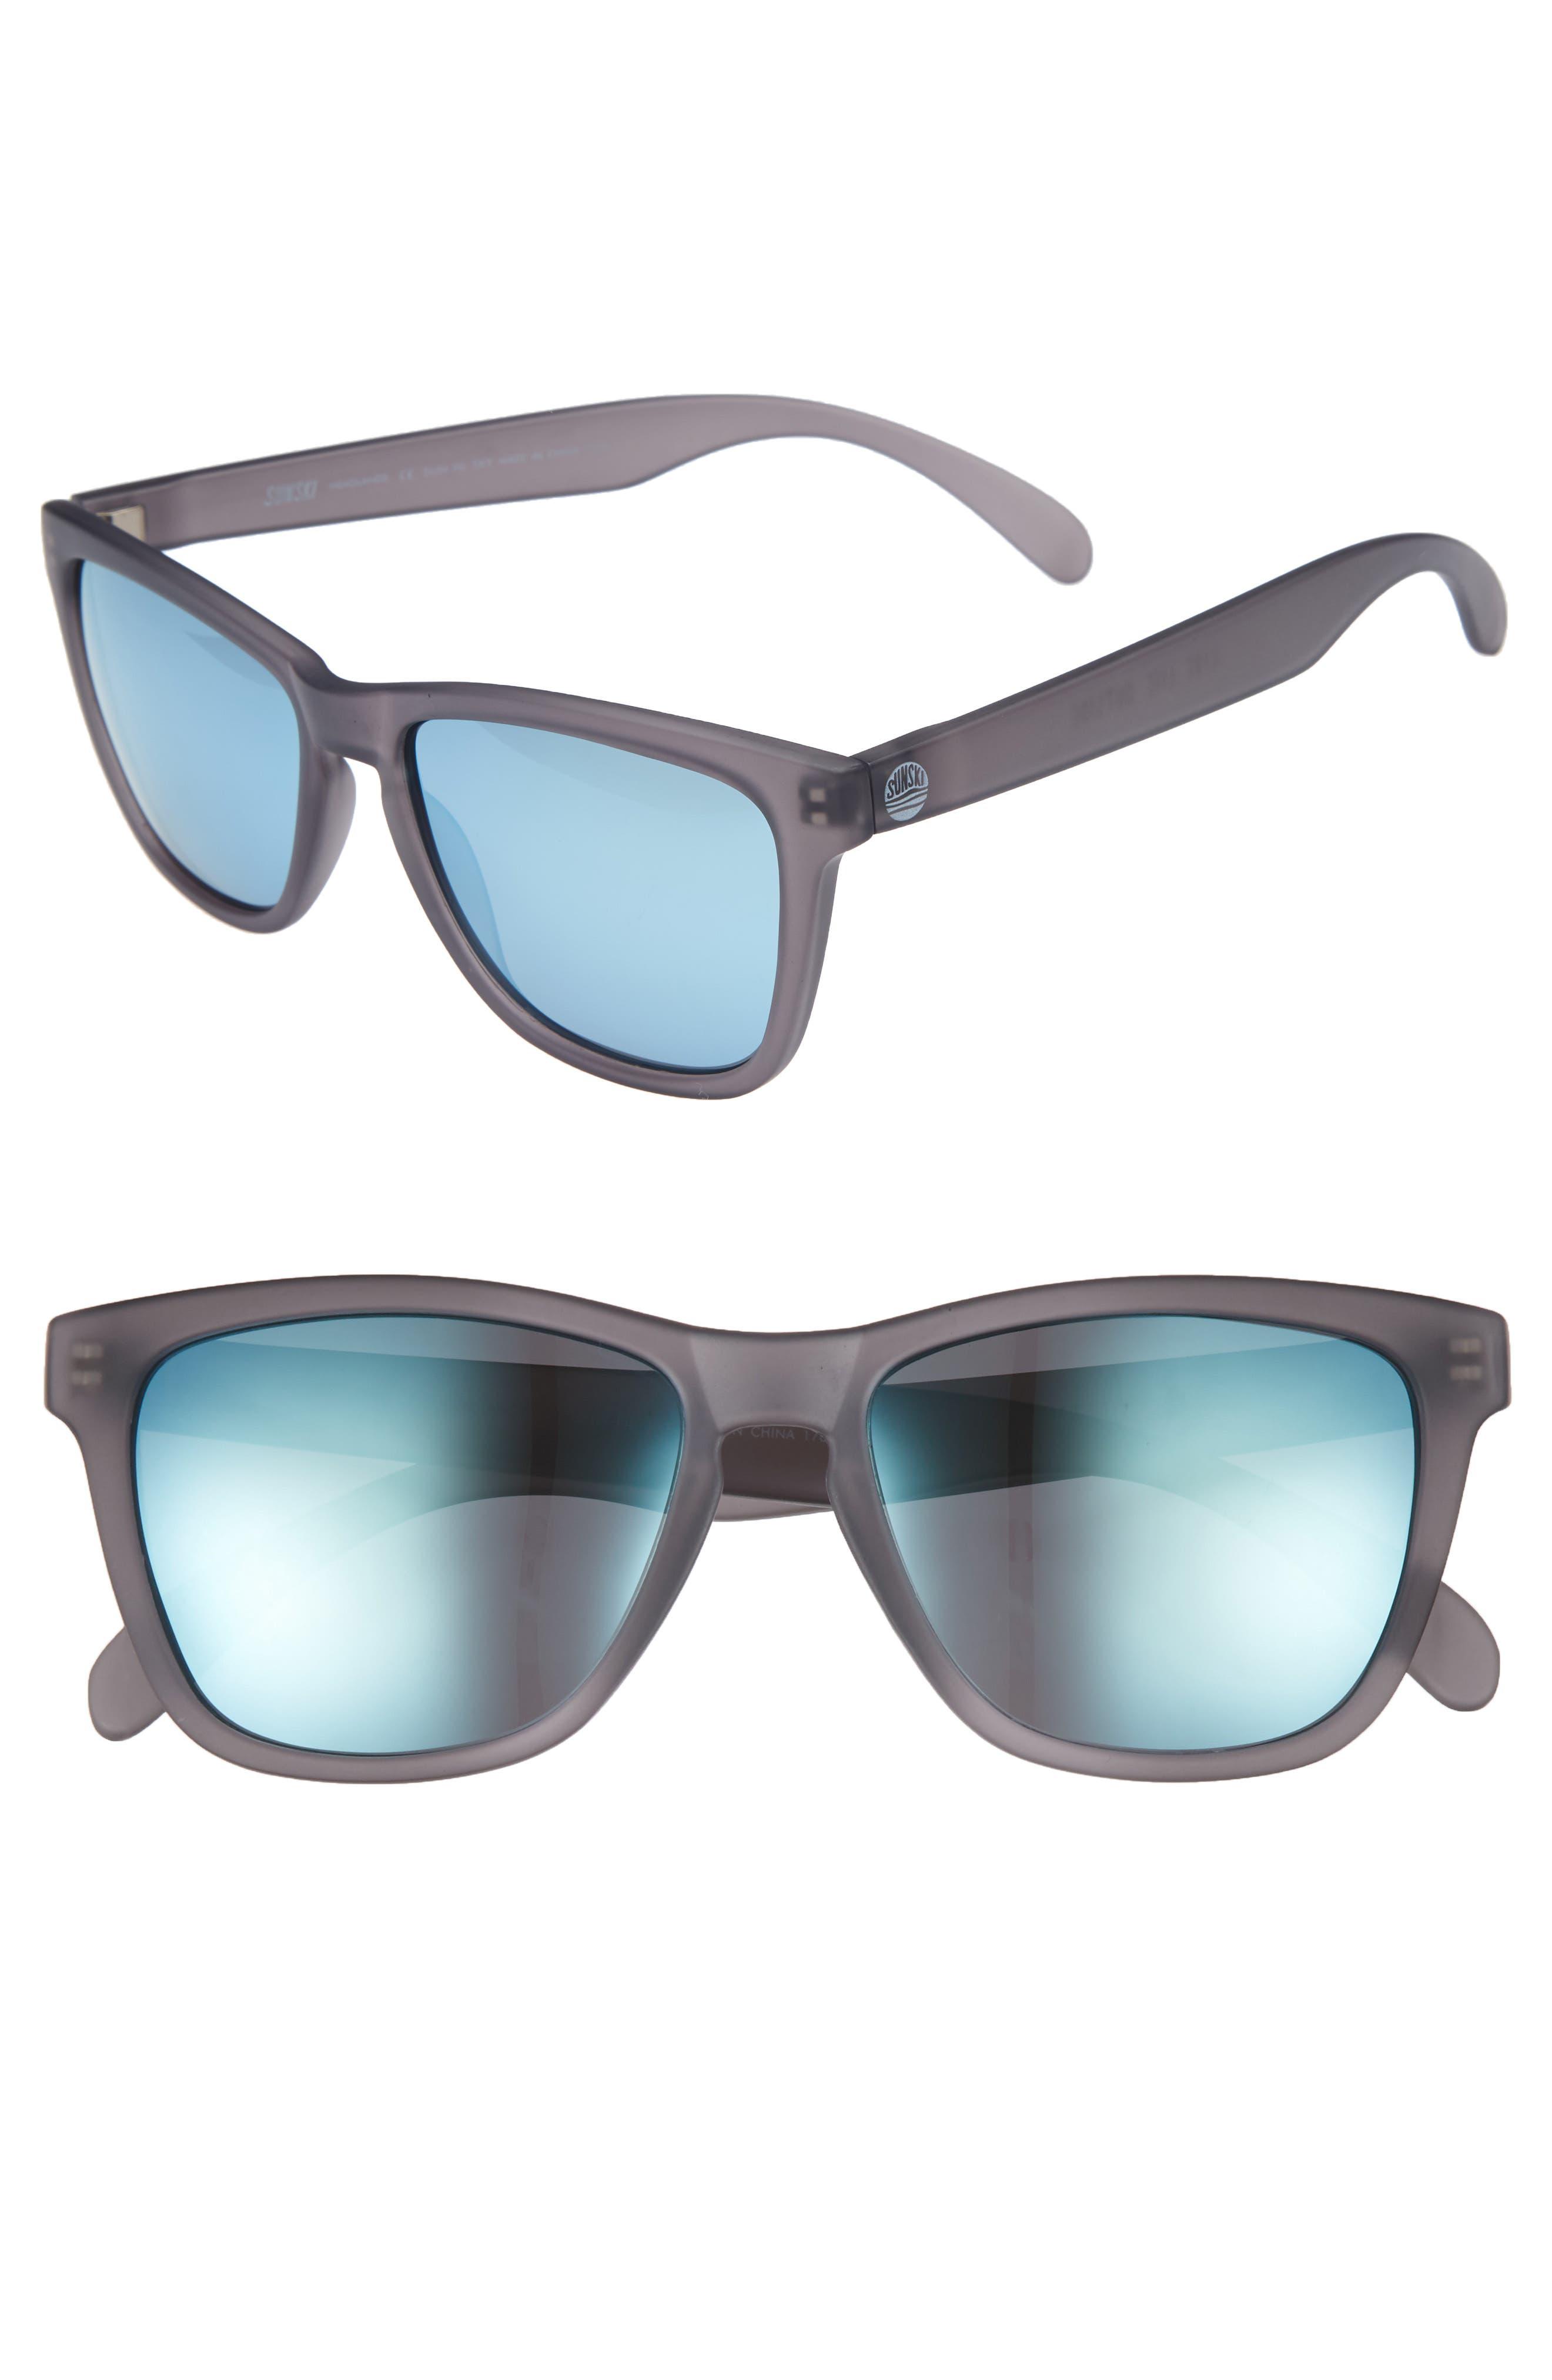 Alternate Image 1 Selected - Sunski Headlands 53mm Polarized Sunglasses